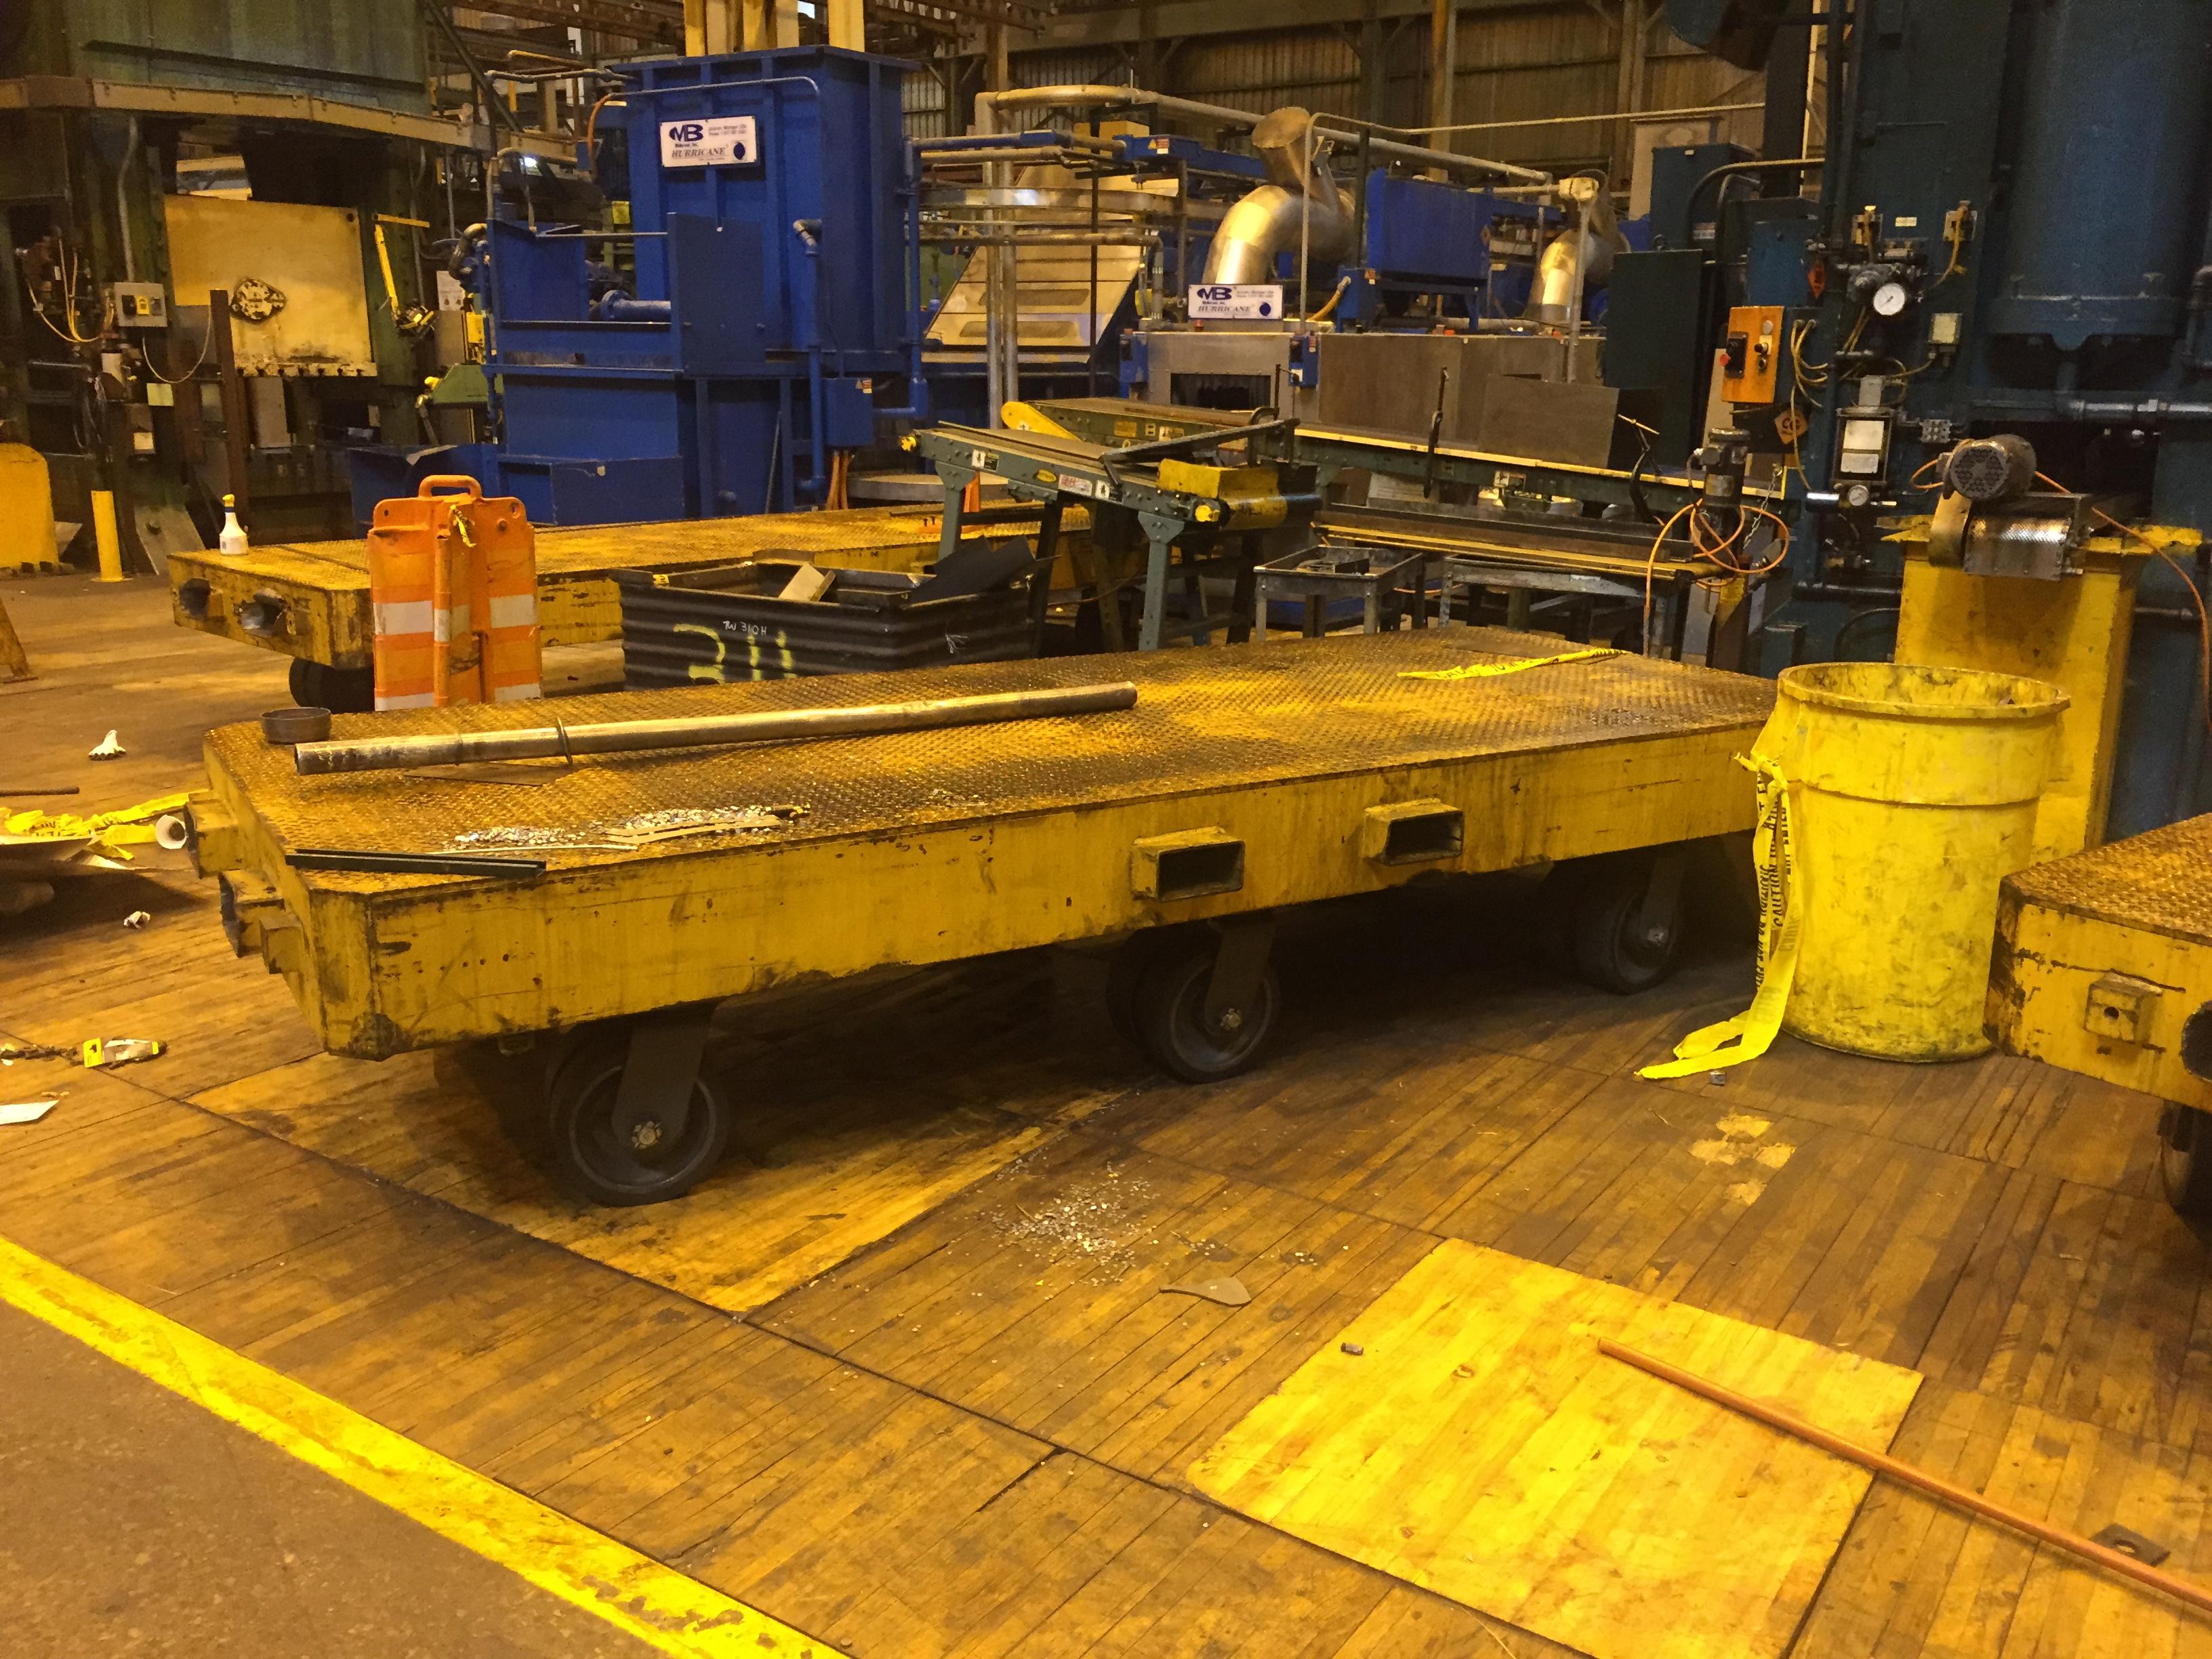 100,000 lb. Die Cart, 15' L x 5' W